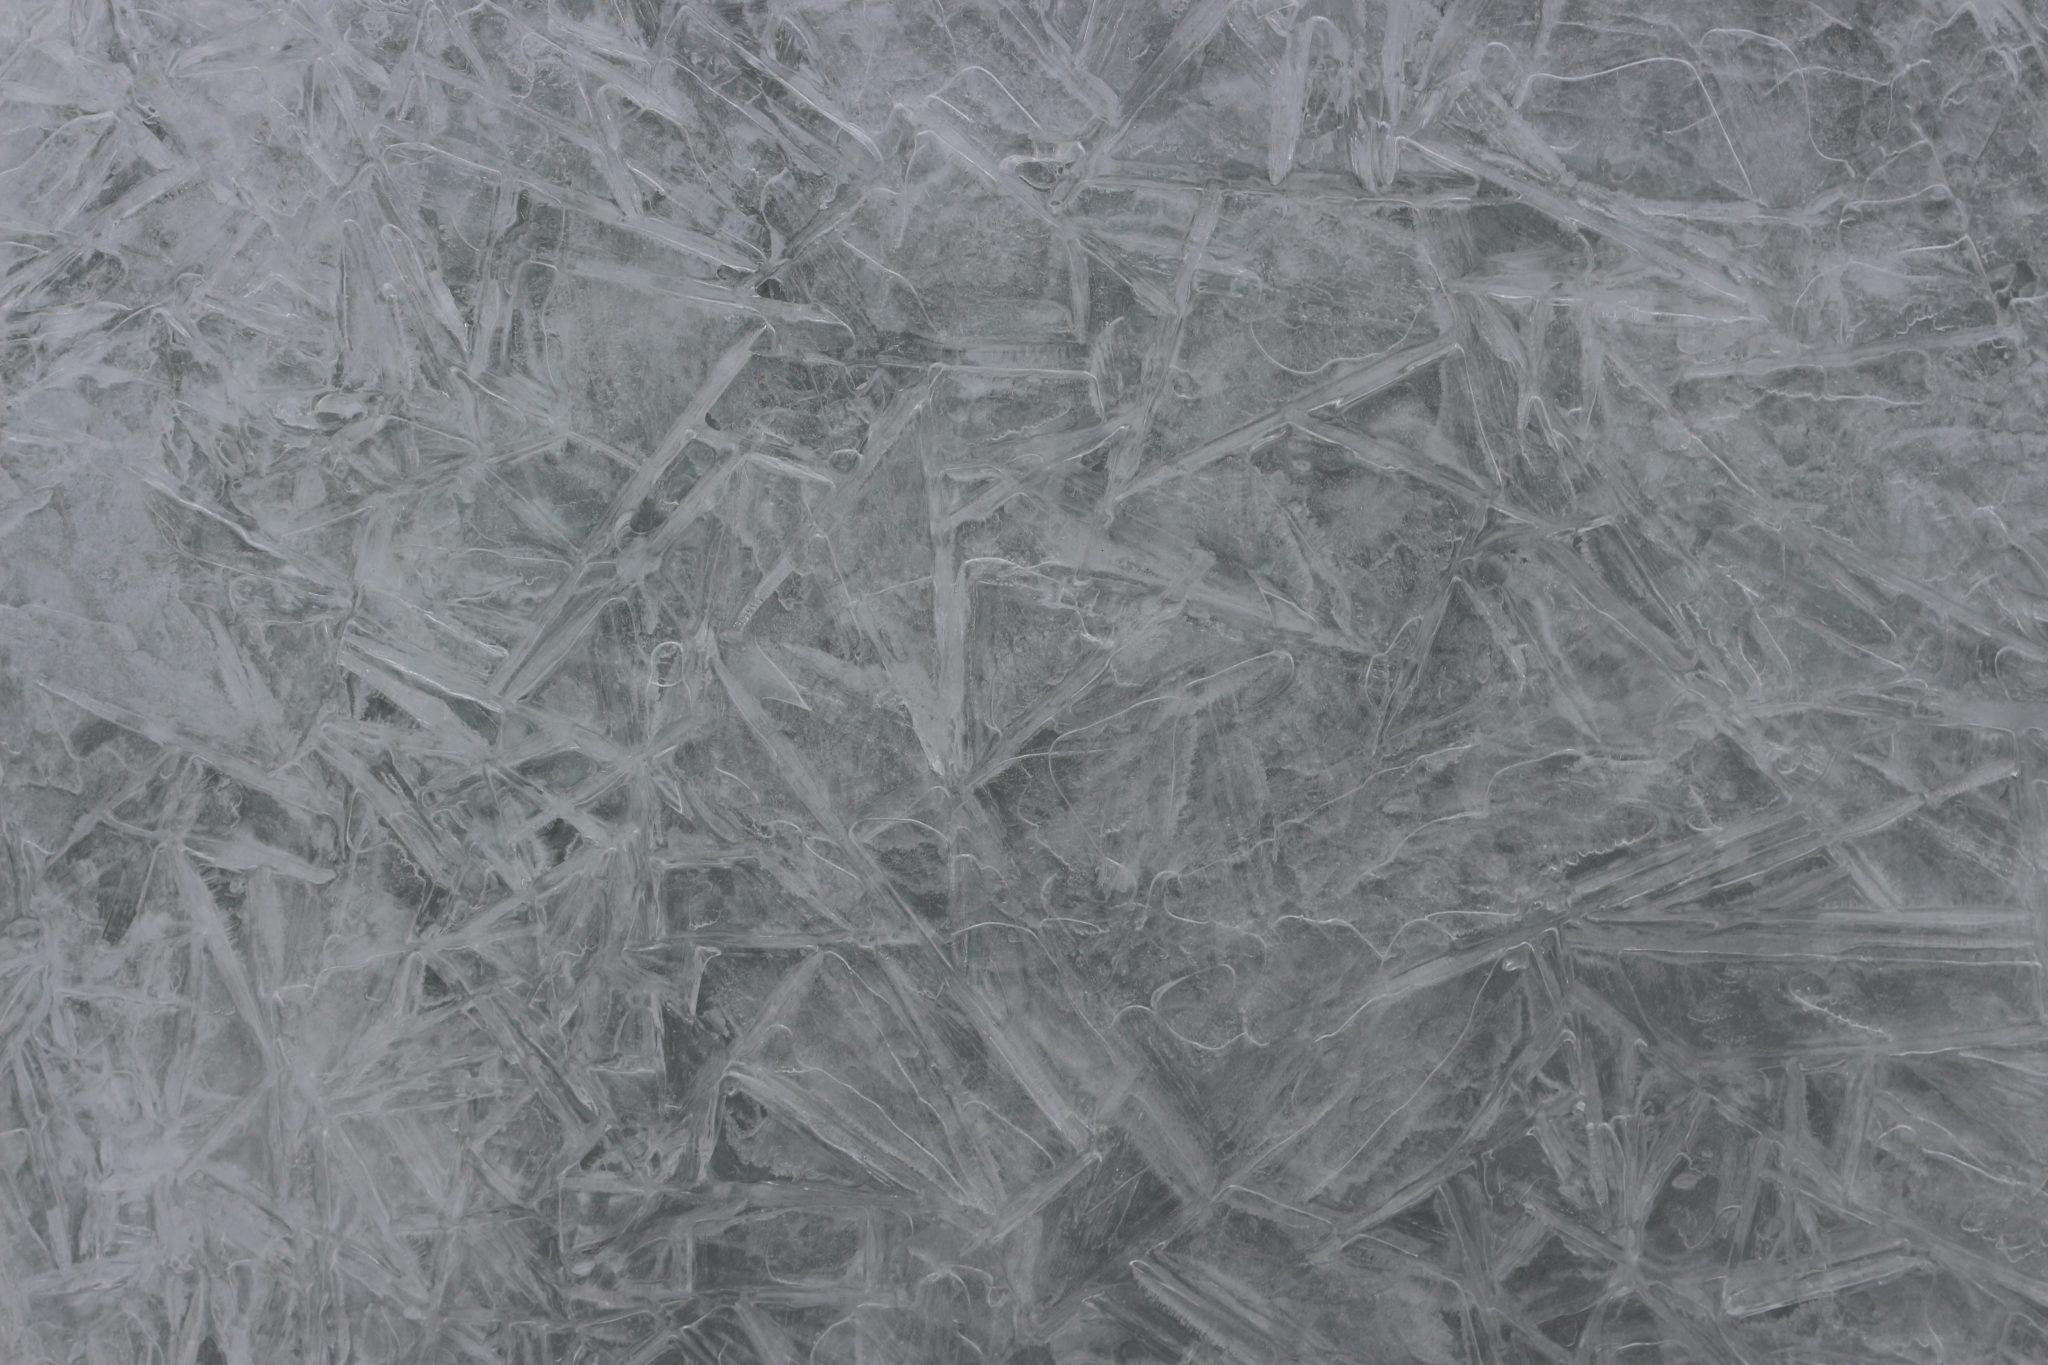 crystallized Water - Zanskar river